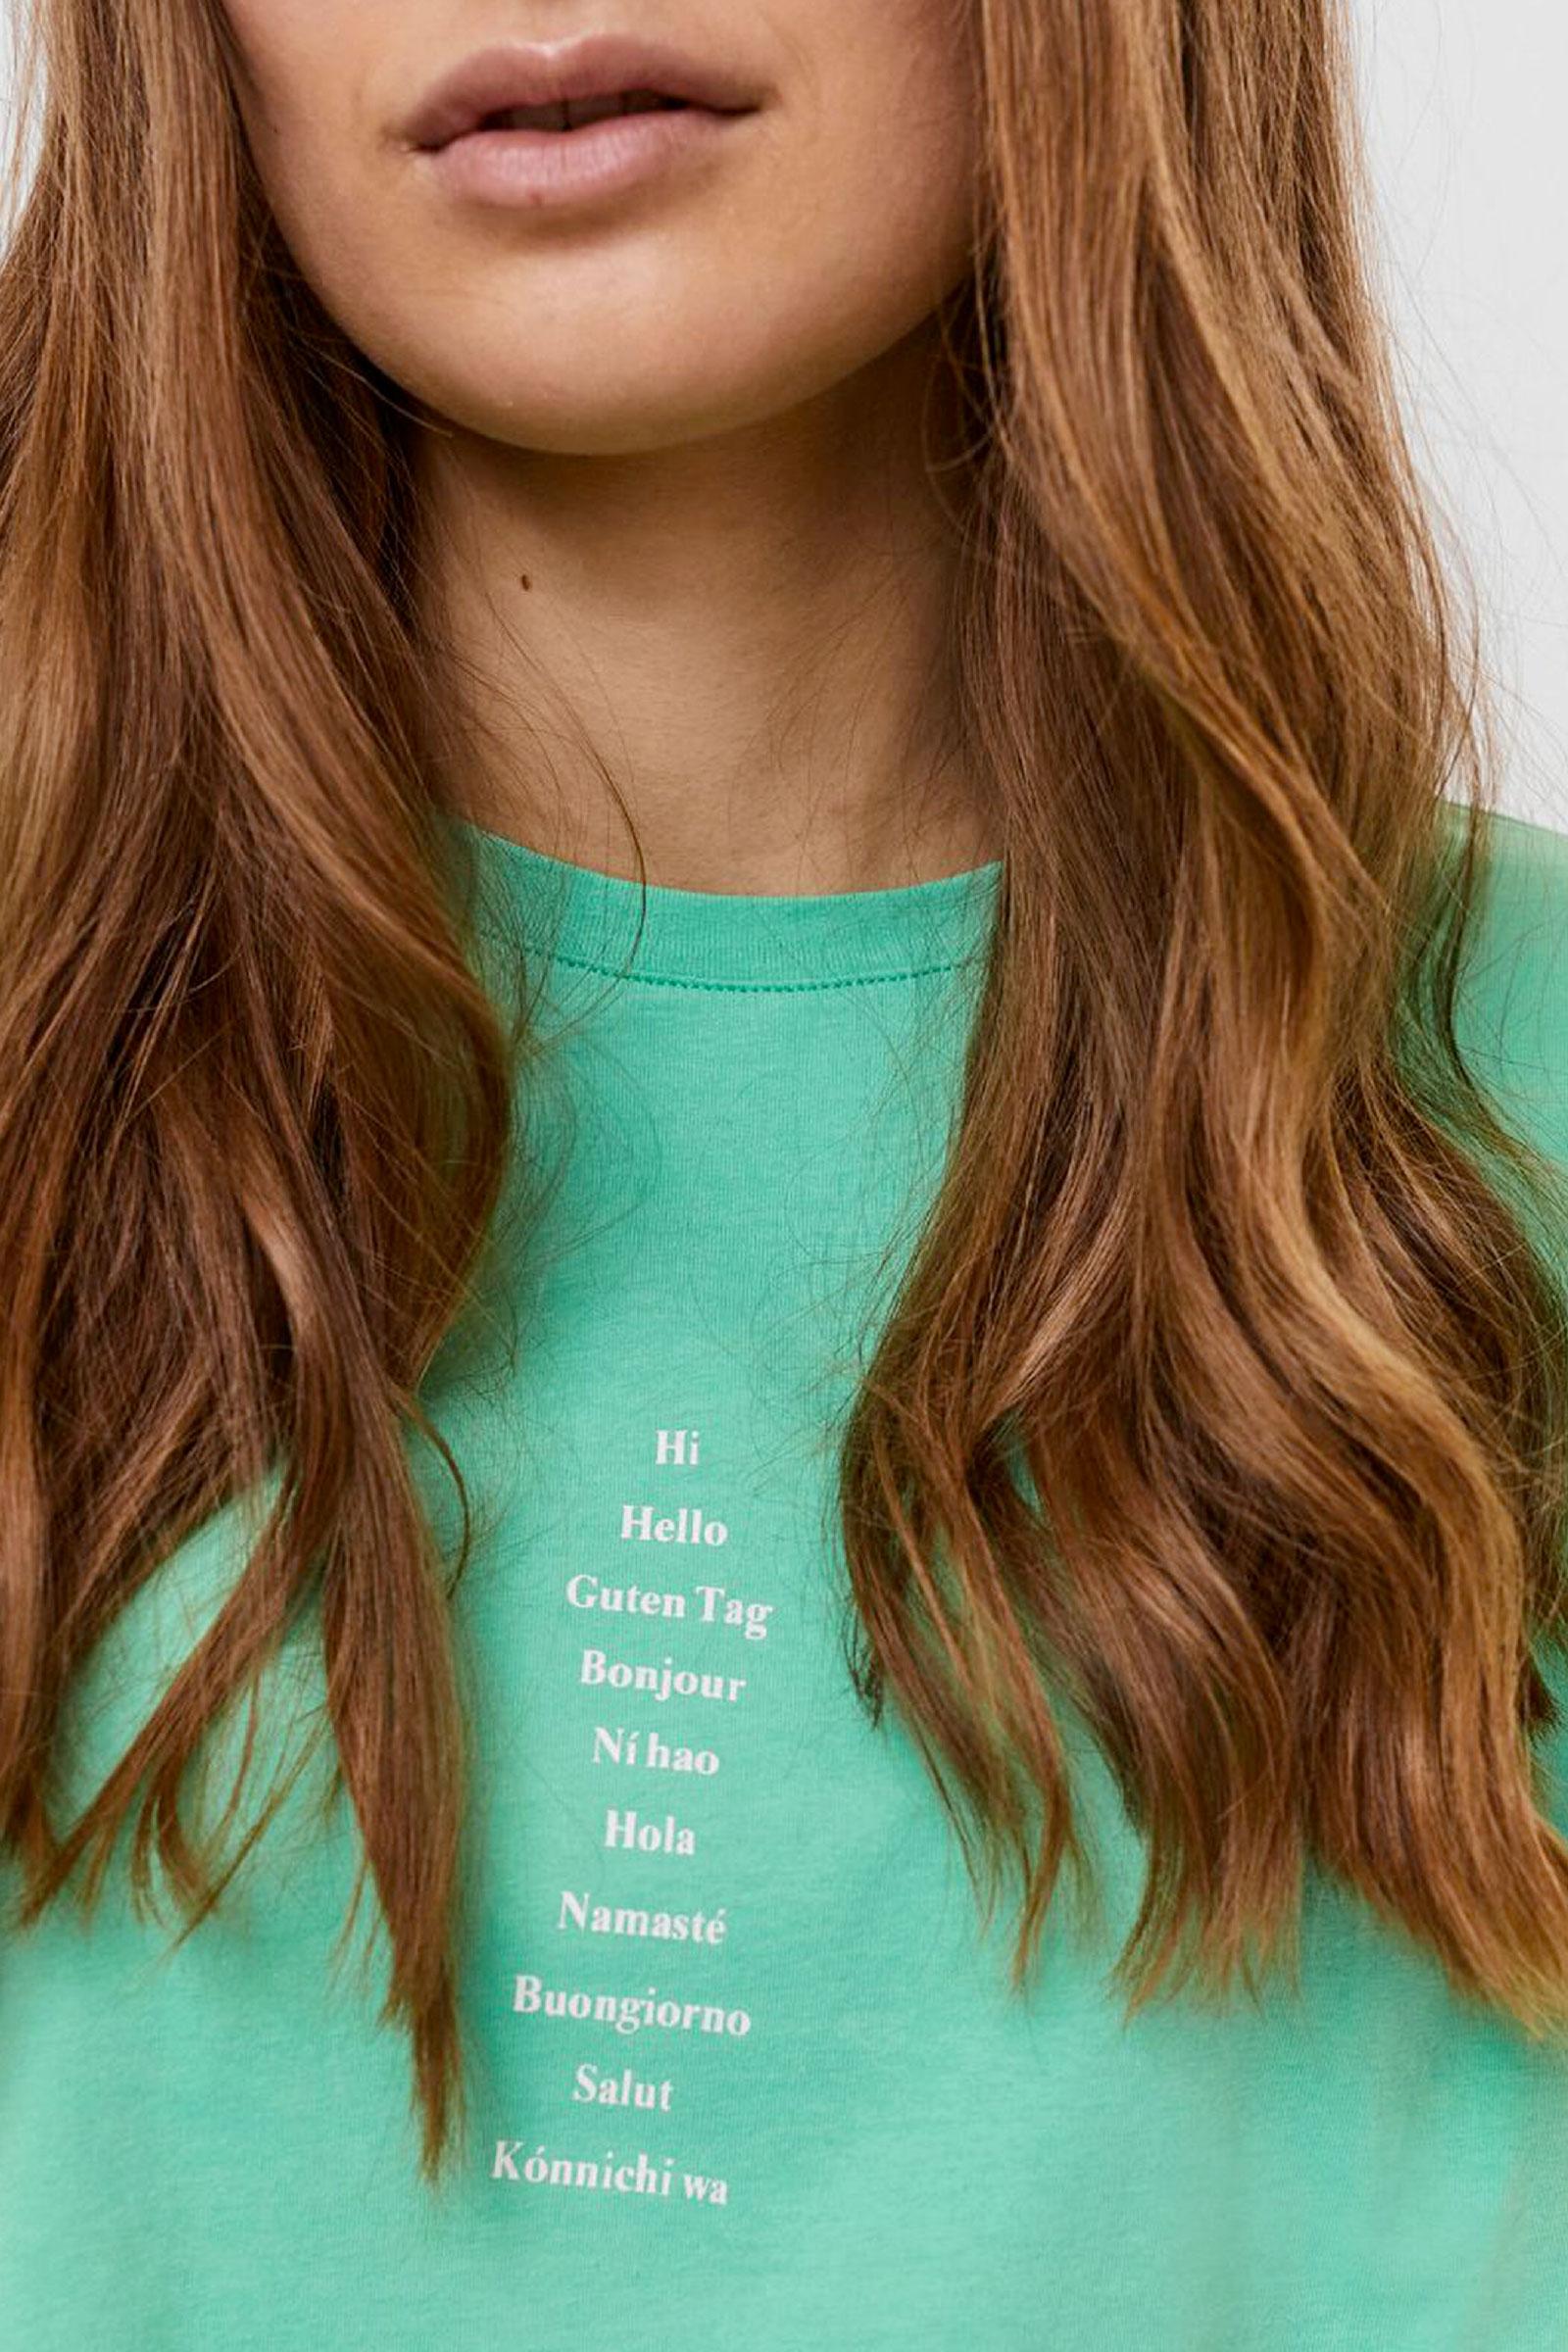 VERO MODA T-SHIRT Donna Modello HOLLIE VERO MODA | T-Shirt | 10245256Print-TEXT IN A LINE